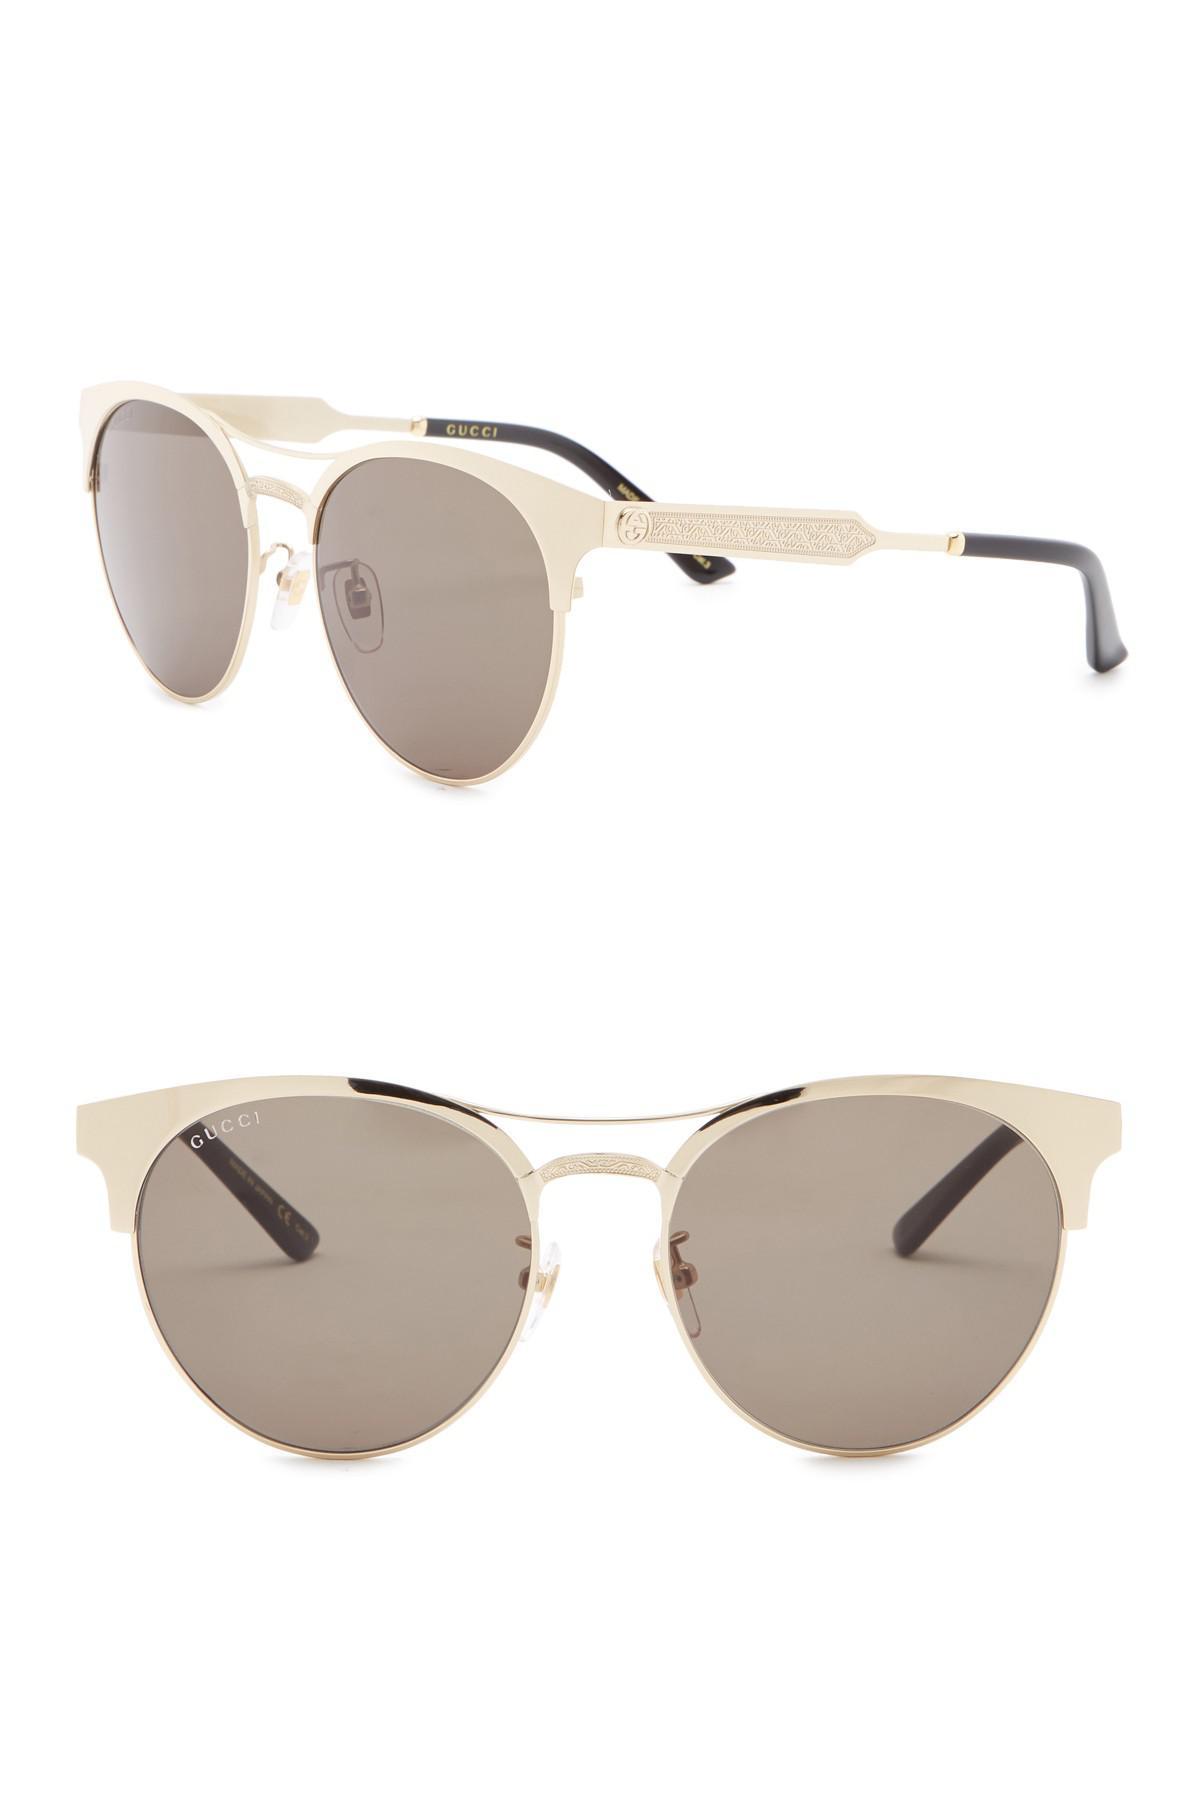 e027ddf1099 Lyst - Gucci 56mm Round Browbar Sunglasses in Metallic